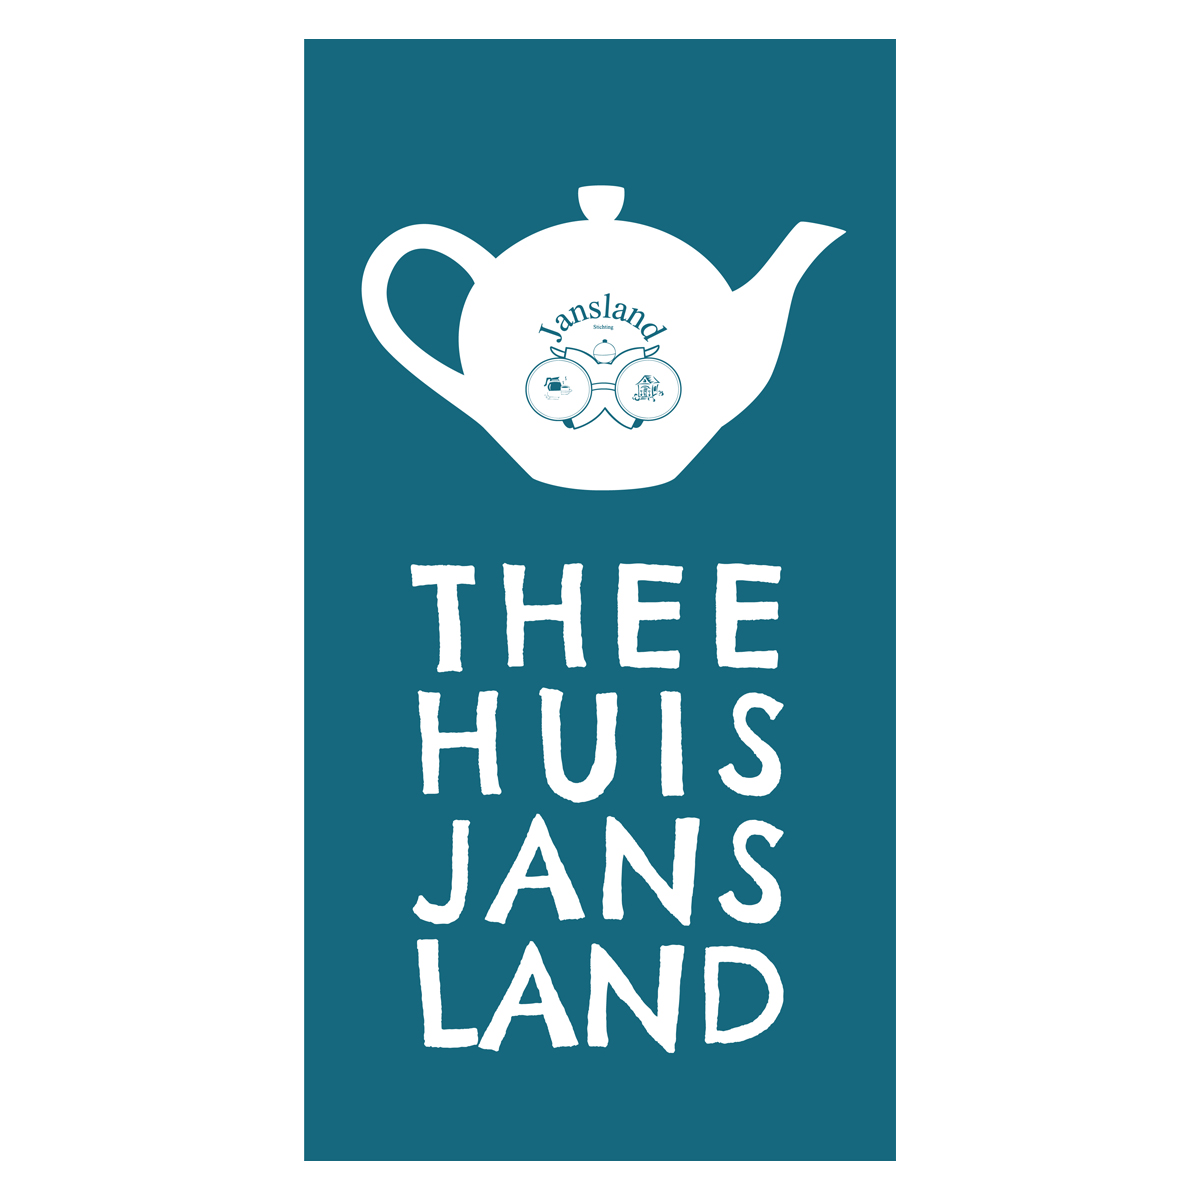 Theehuis Jansland - Logo